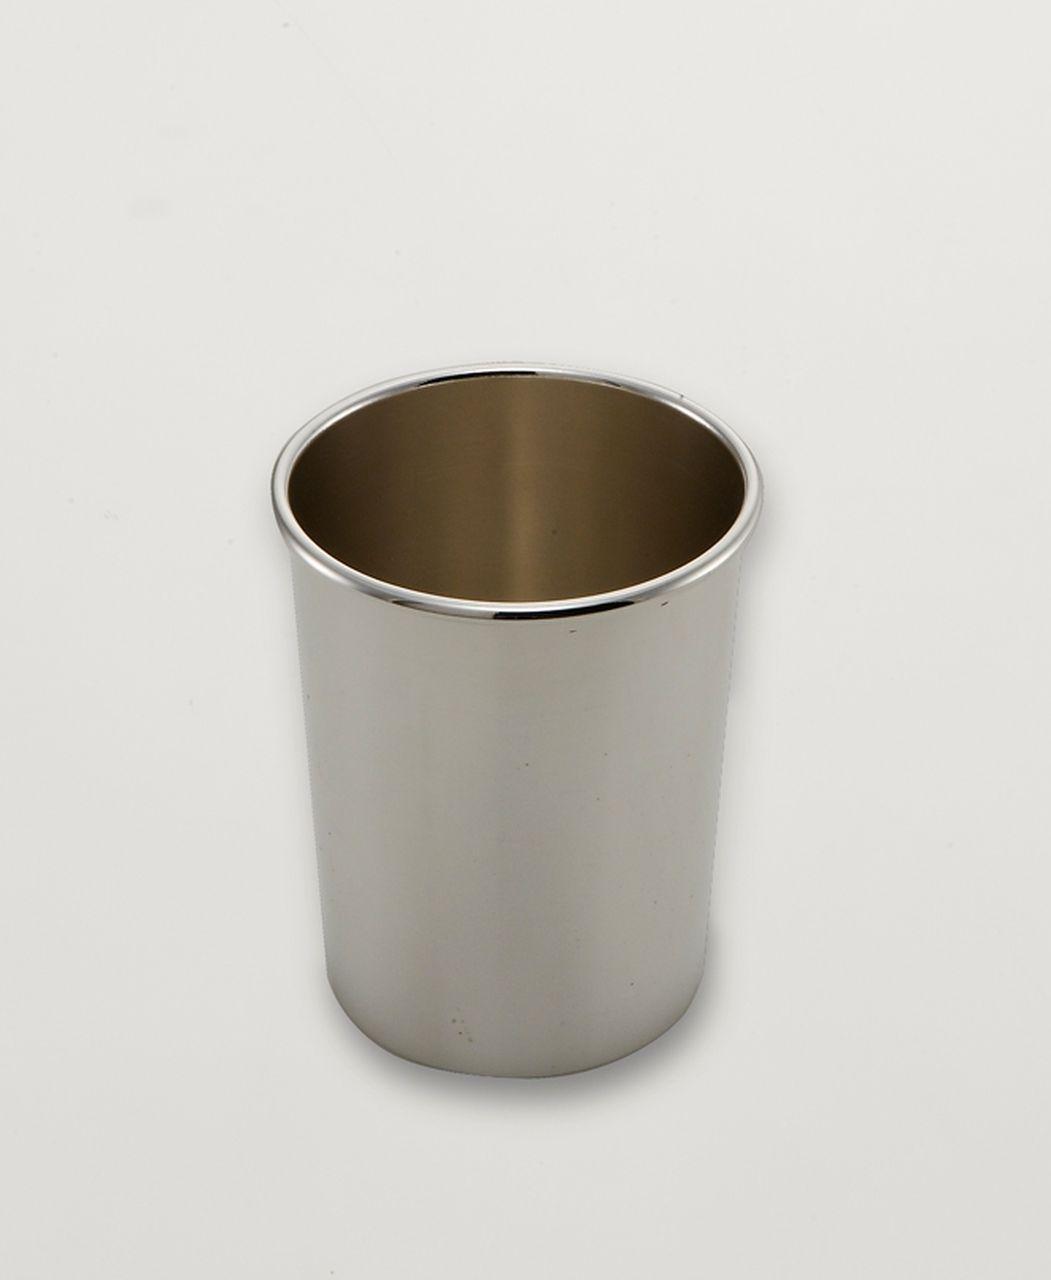 Bicchierino classic argentato argento sheffield cm.6,5h diam.6,2